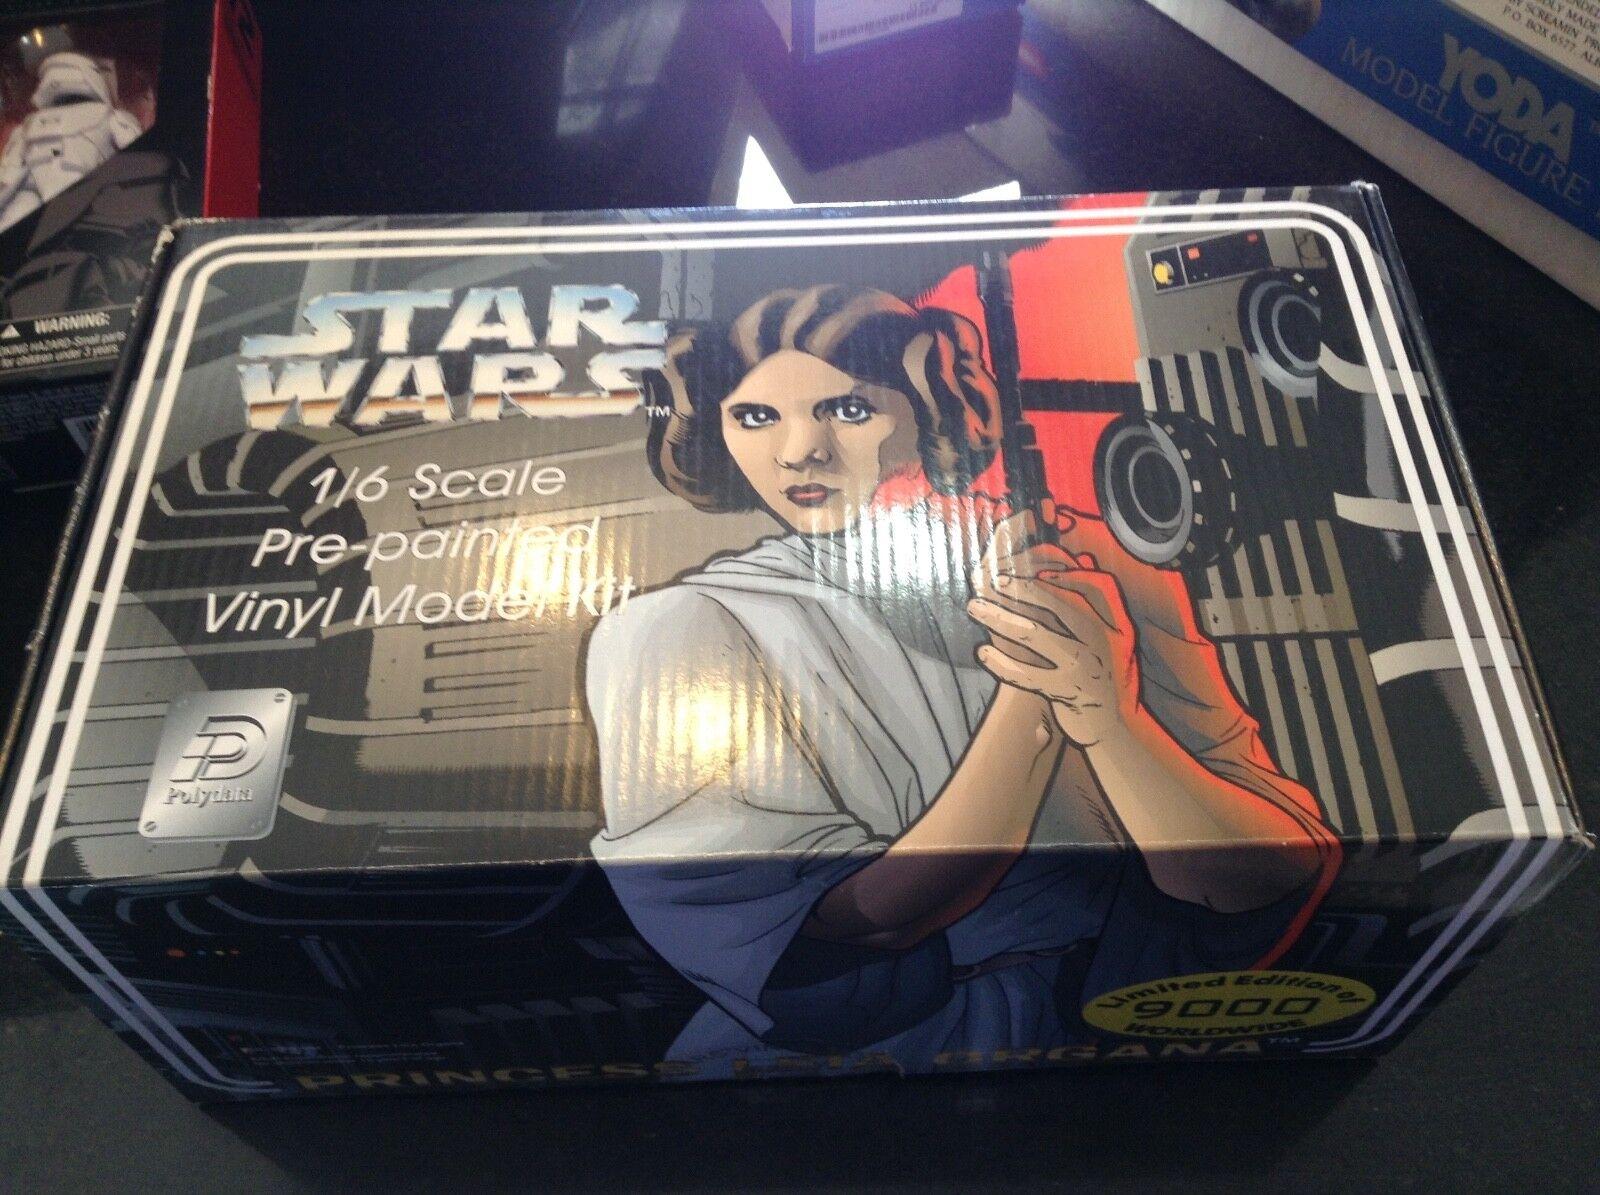 La princesa Leia Organa por PolyData, Limited 9000 Worldwide  Prepintado escala 1 6